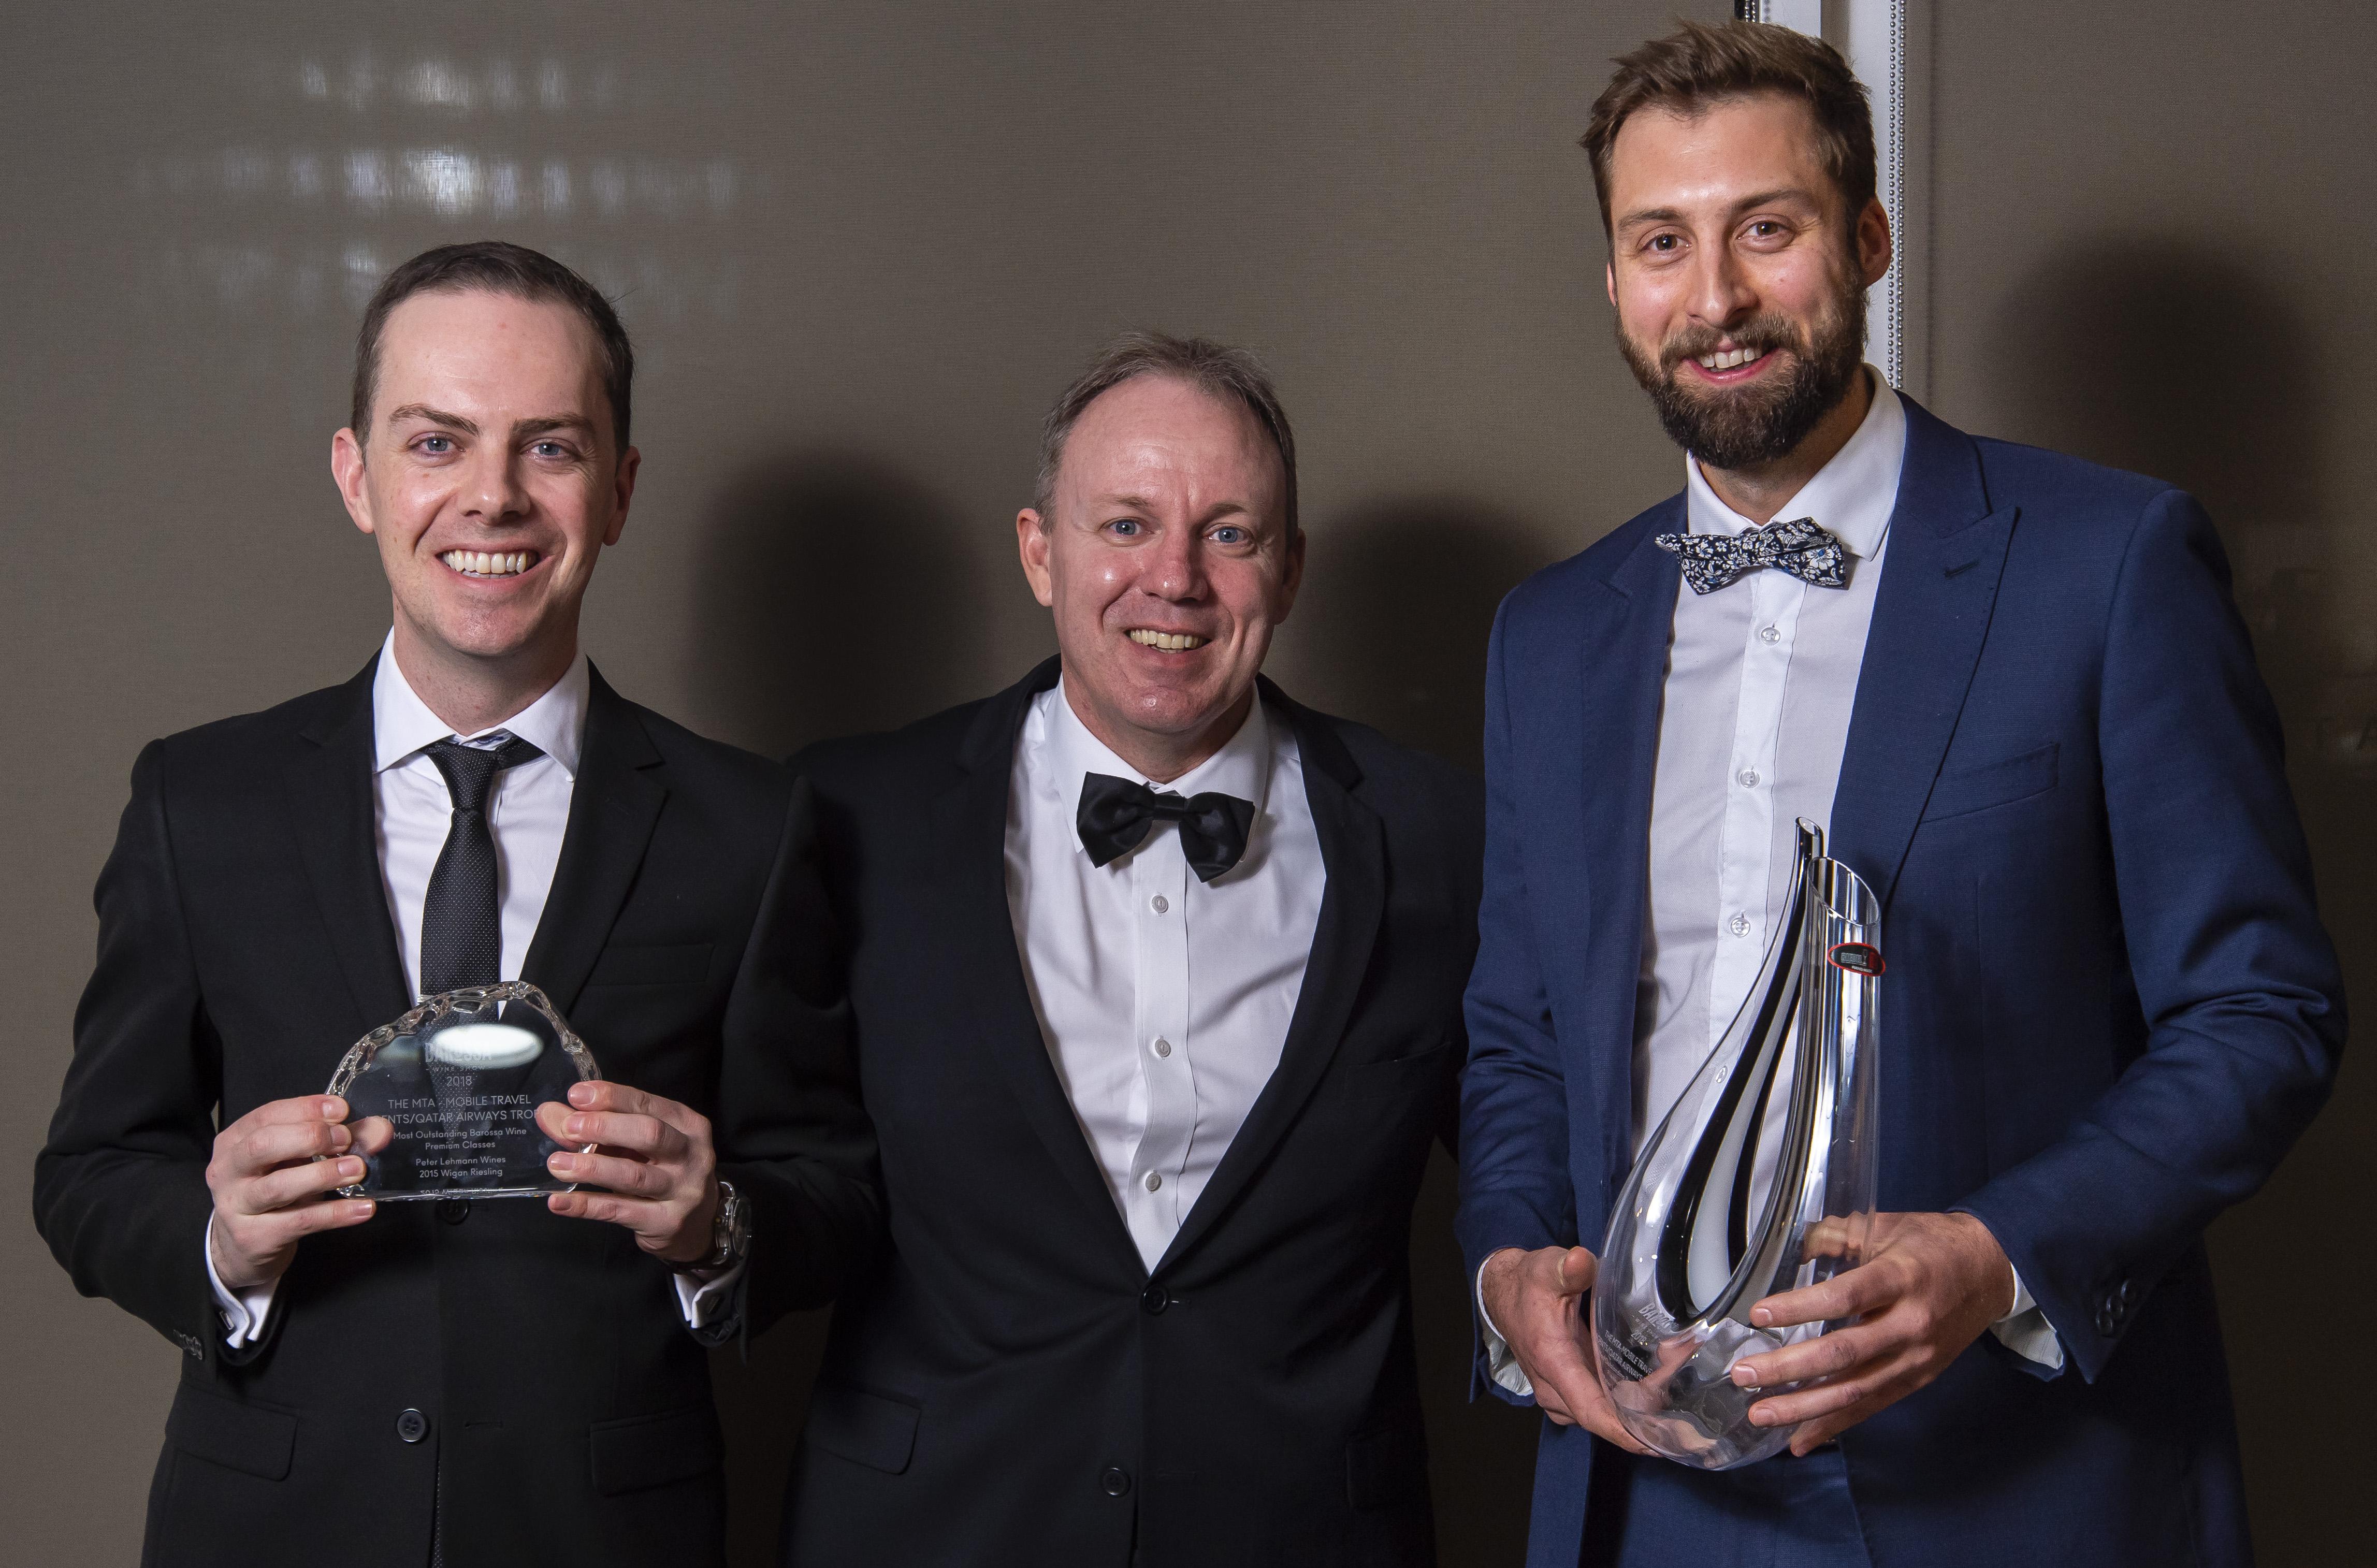 Steven Eikhoff and Aaron Sard (MTA & Qatar Airways) present Tim Dolan with the MTA- Mobile Travel Agents / Qatar Airways Trophy, Most Outstanding Barossa Wine, Premium Classes, Barossa Wine Show 2018